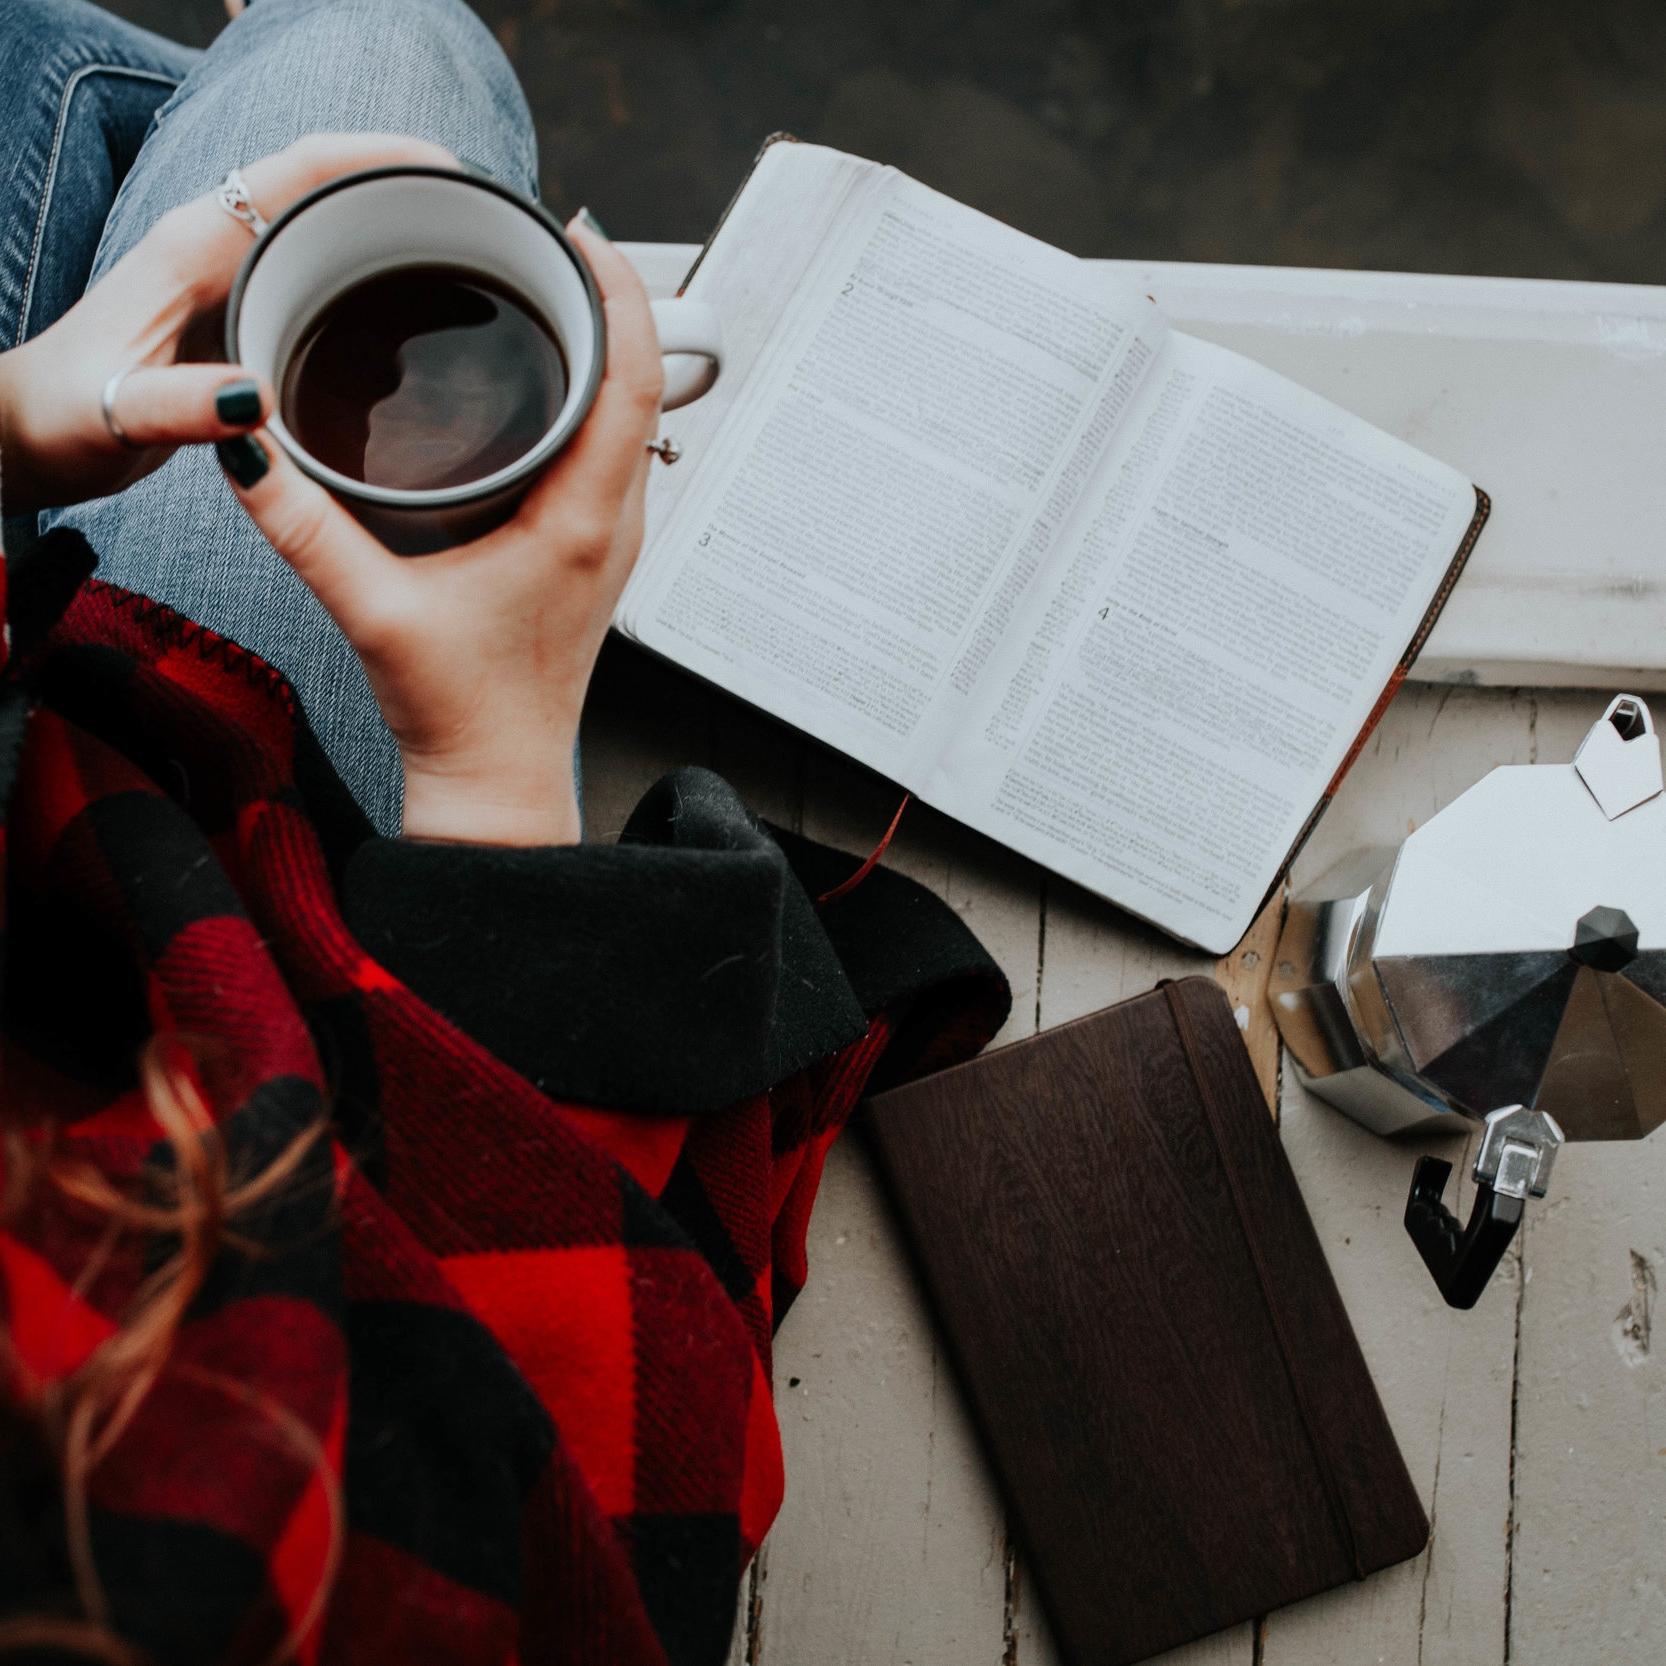 Convergence - Spiritual Vitality in a Post-Christian Culture